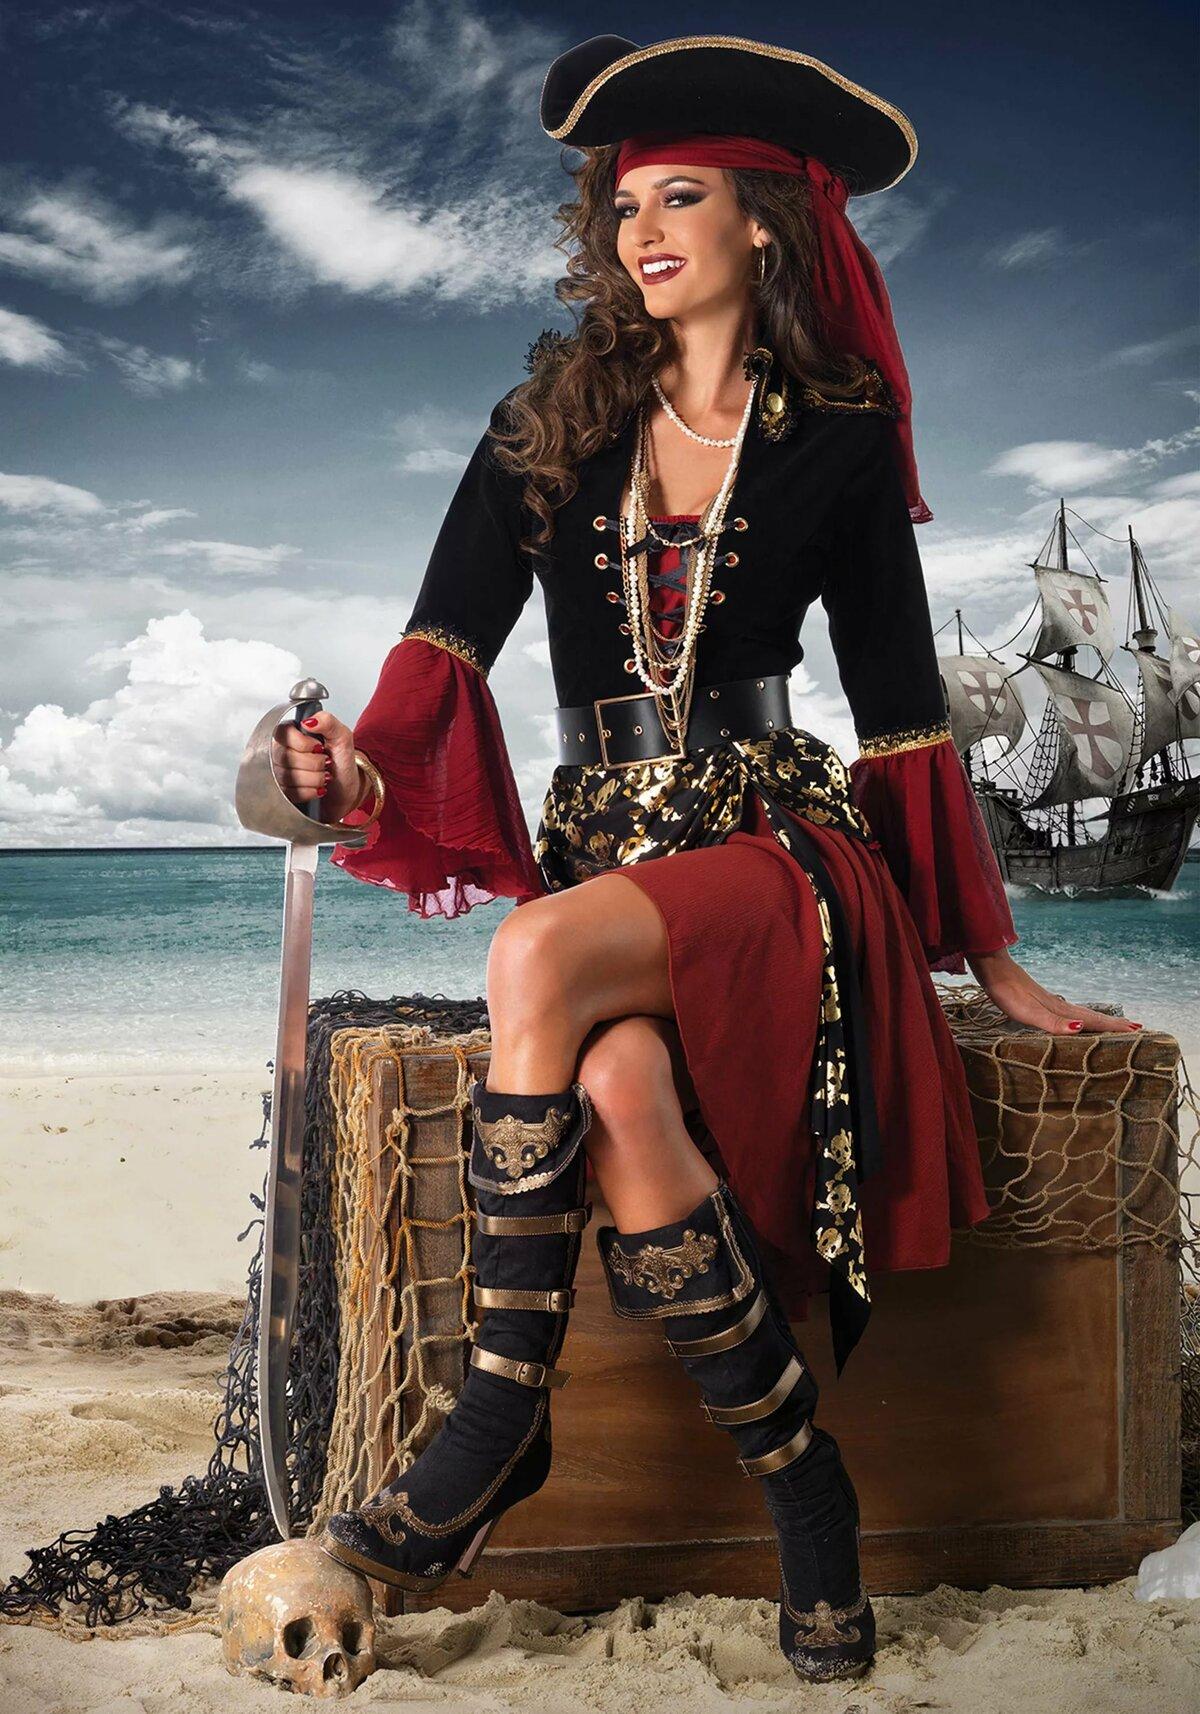 пиратки фото без головы масла могут